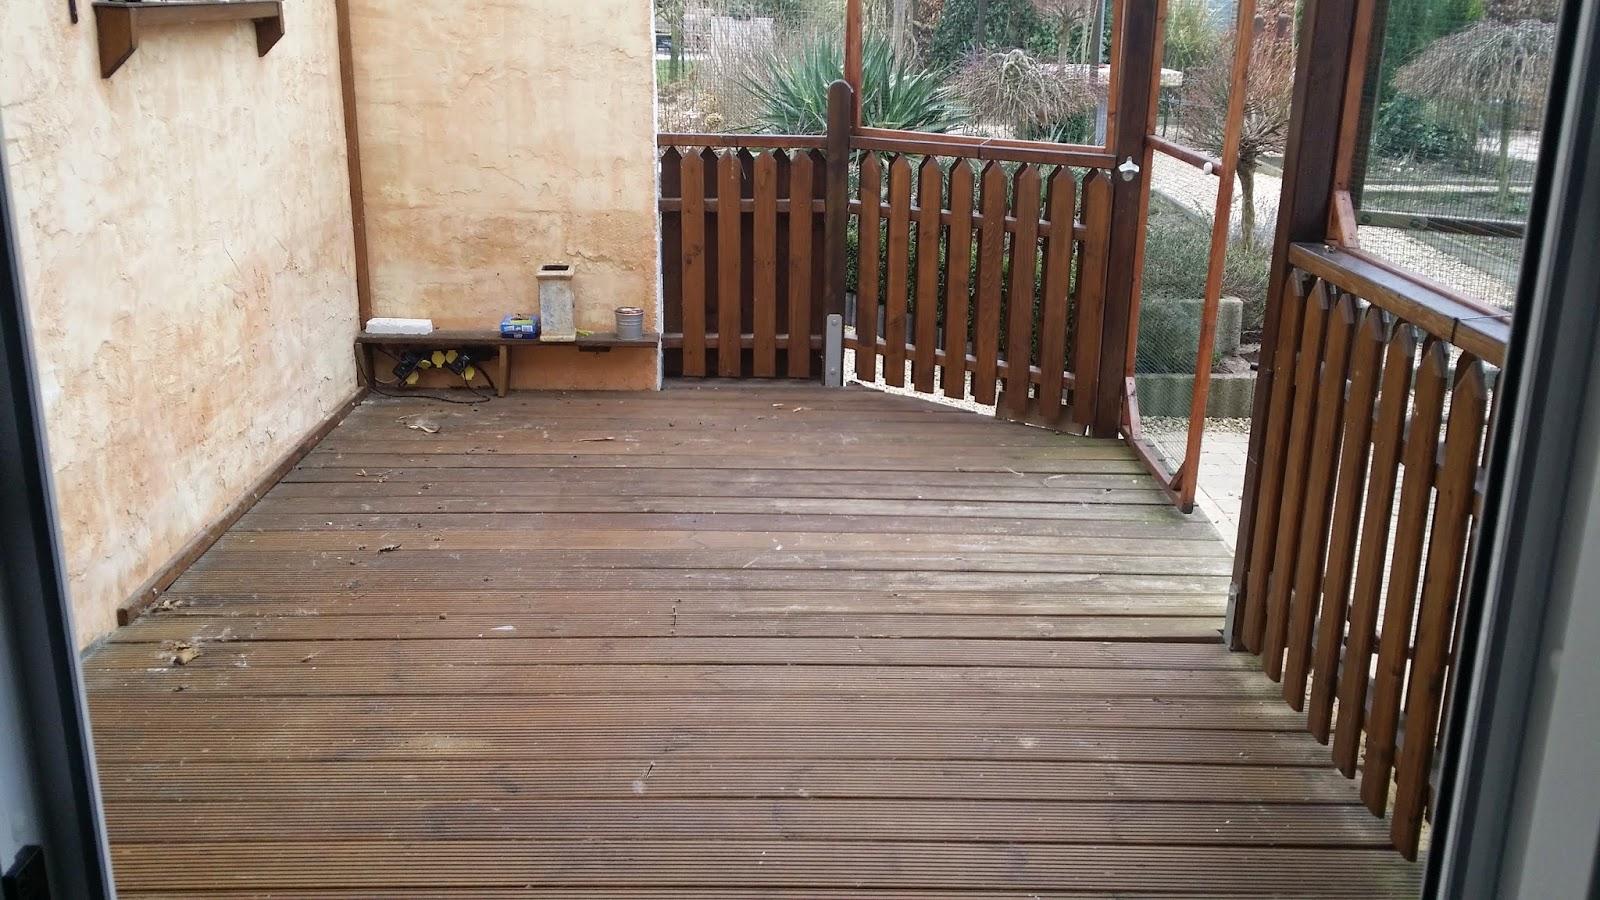 Verwonderend Piazza Acido dell Aceto: Veranda vloer KB-11